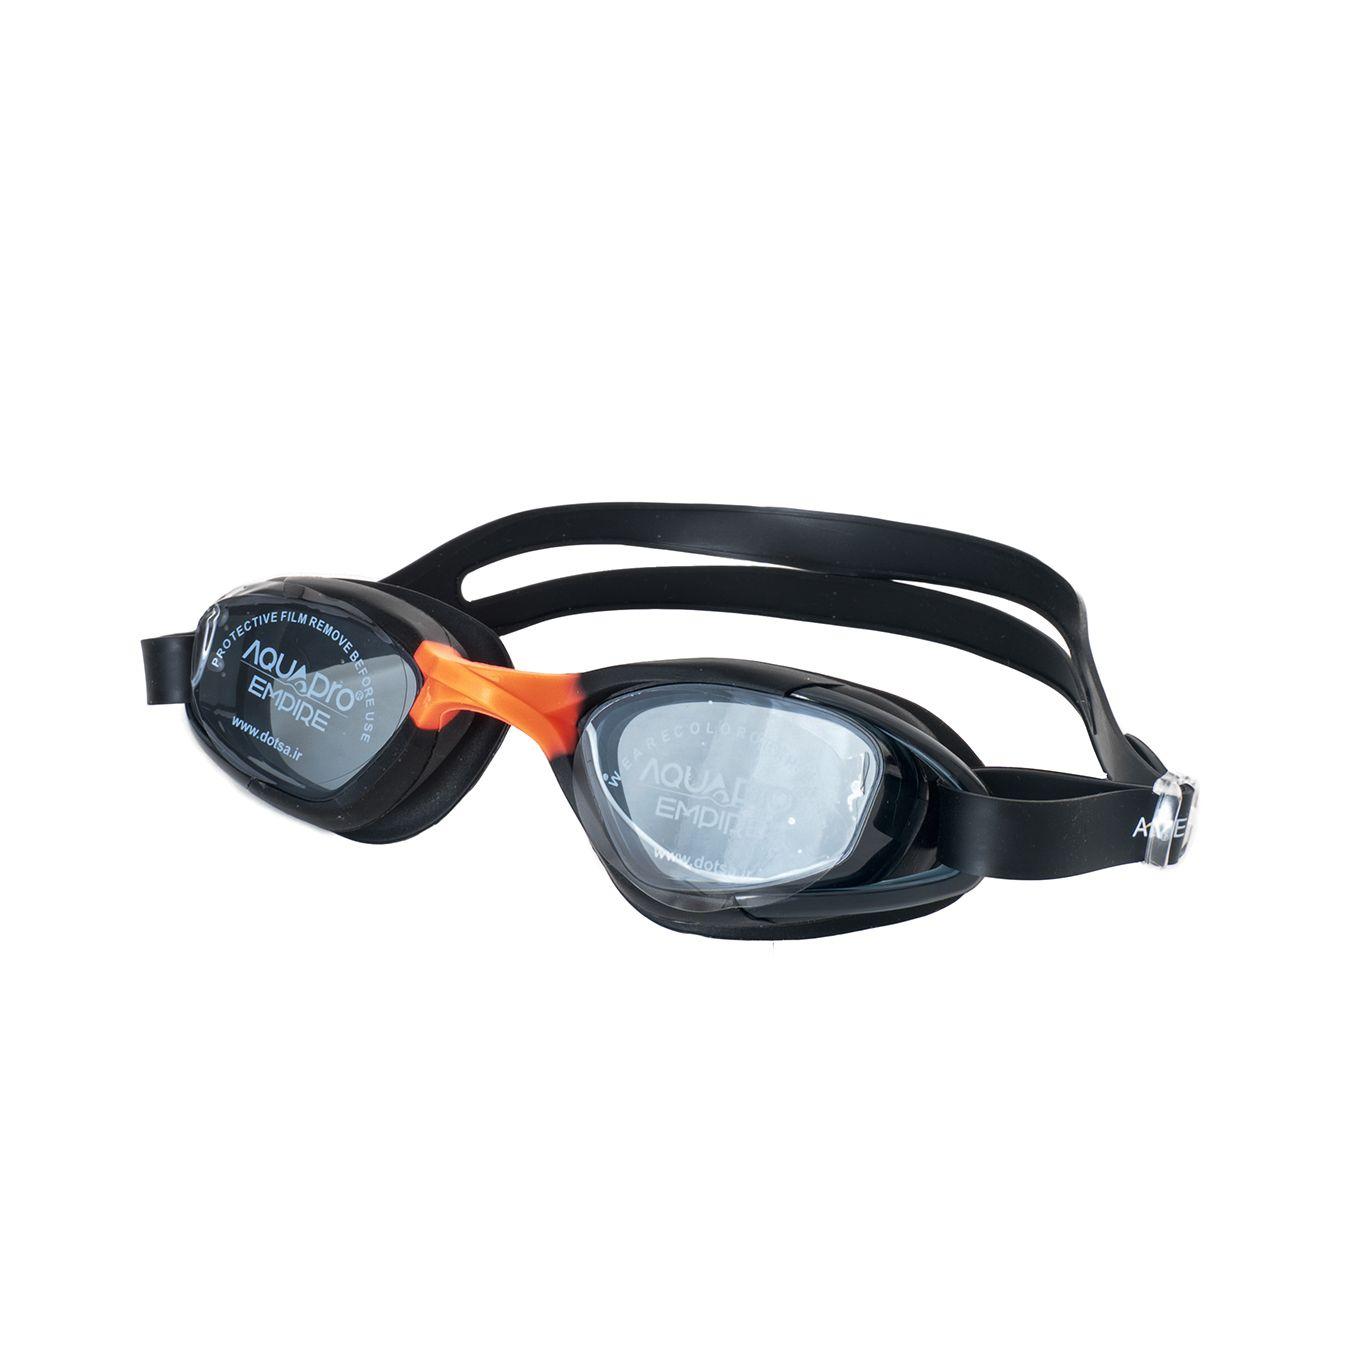 عینک شنا اکوا پرو مدل AMERAGE main 1 8